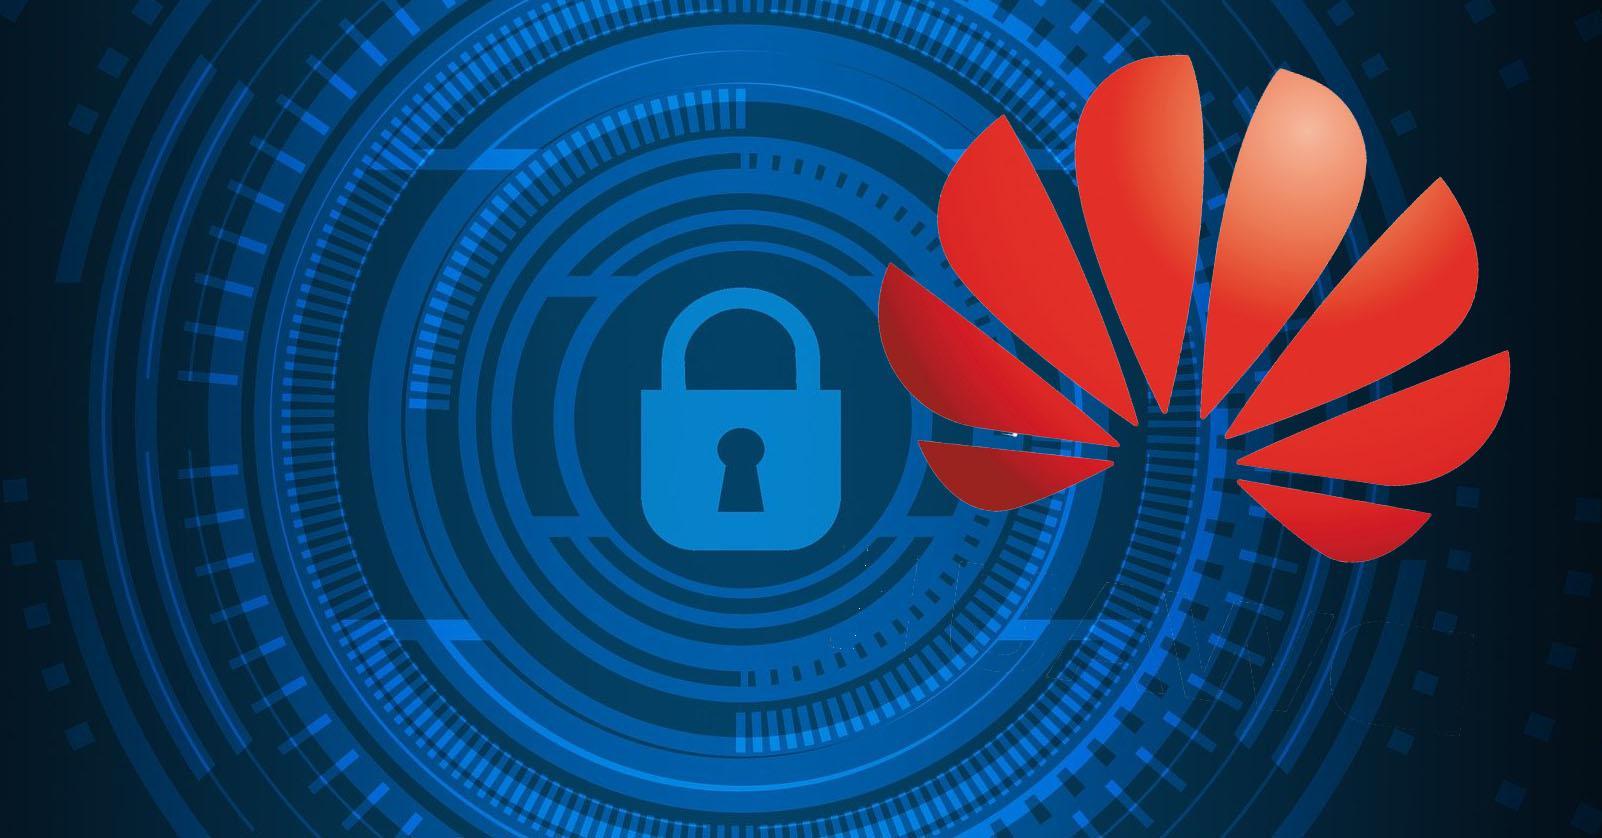 Modo seguro en Huawei